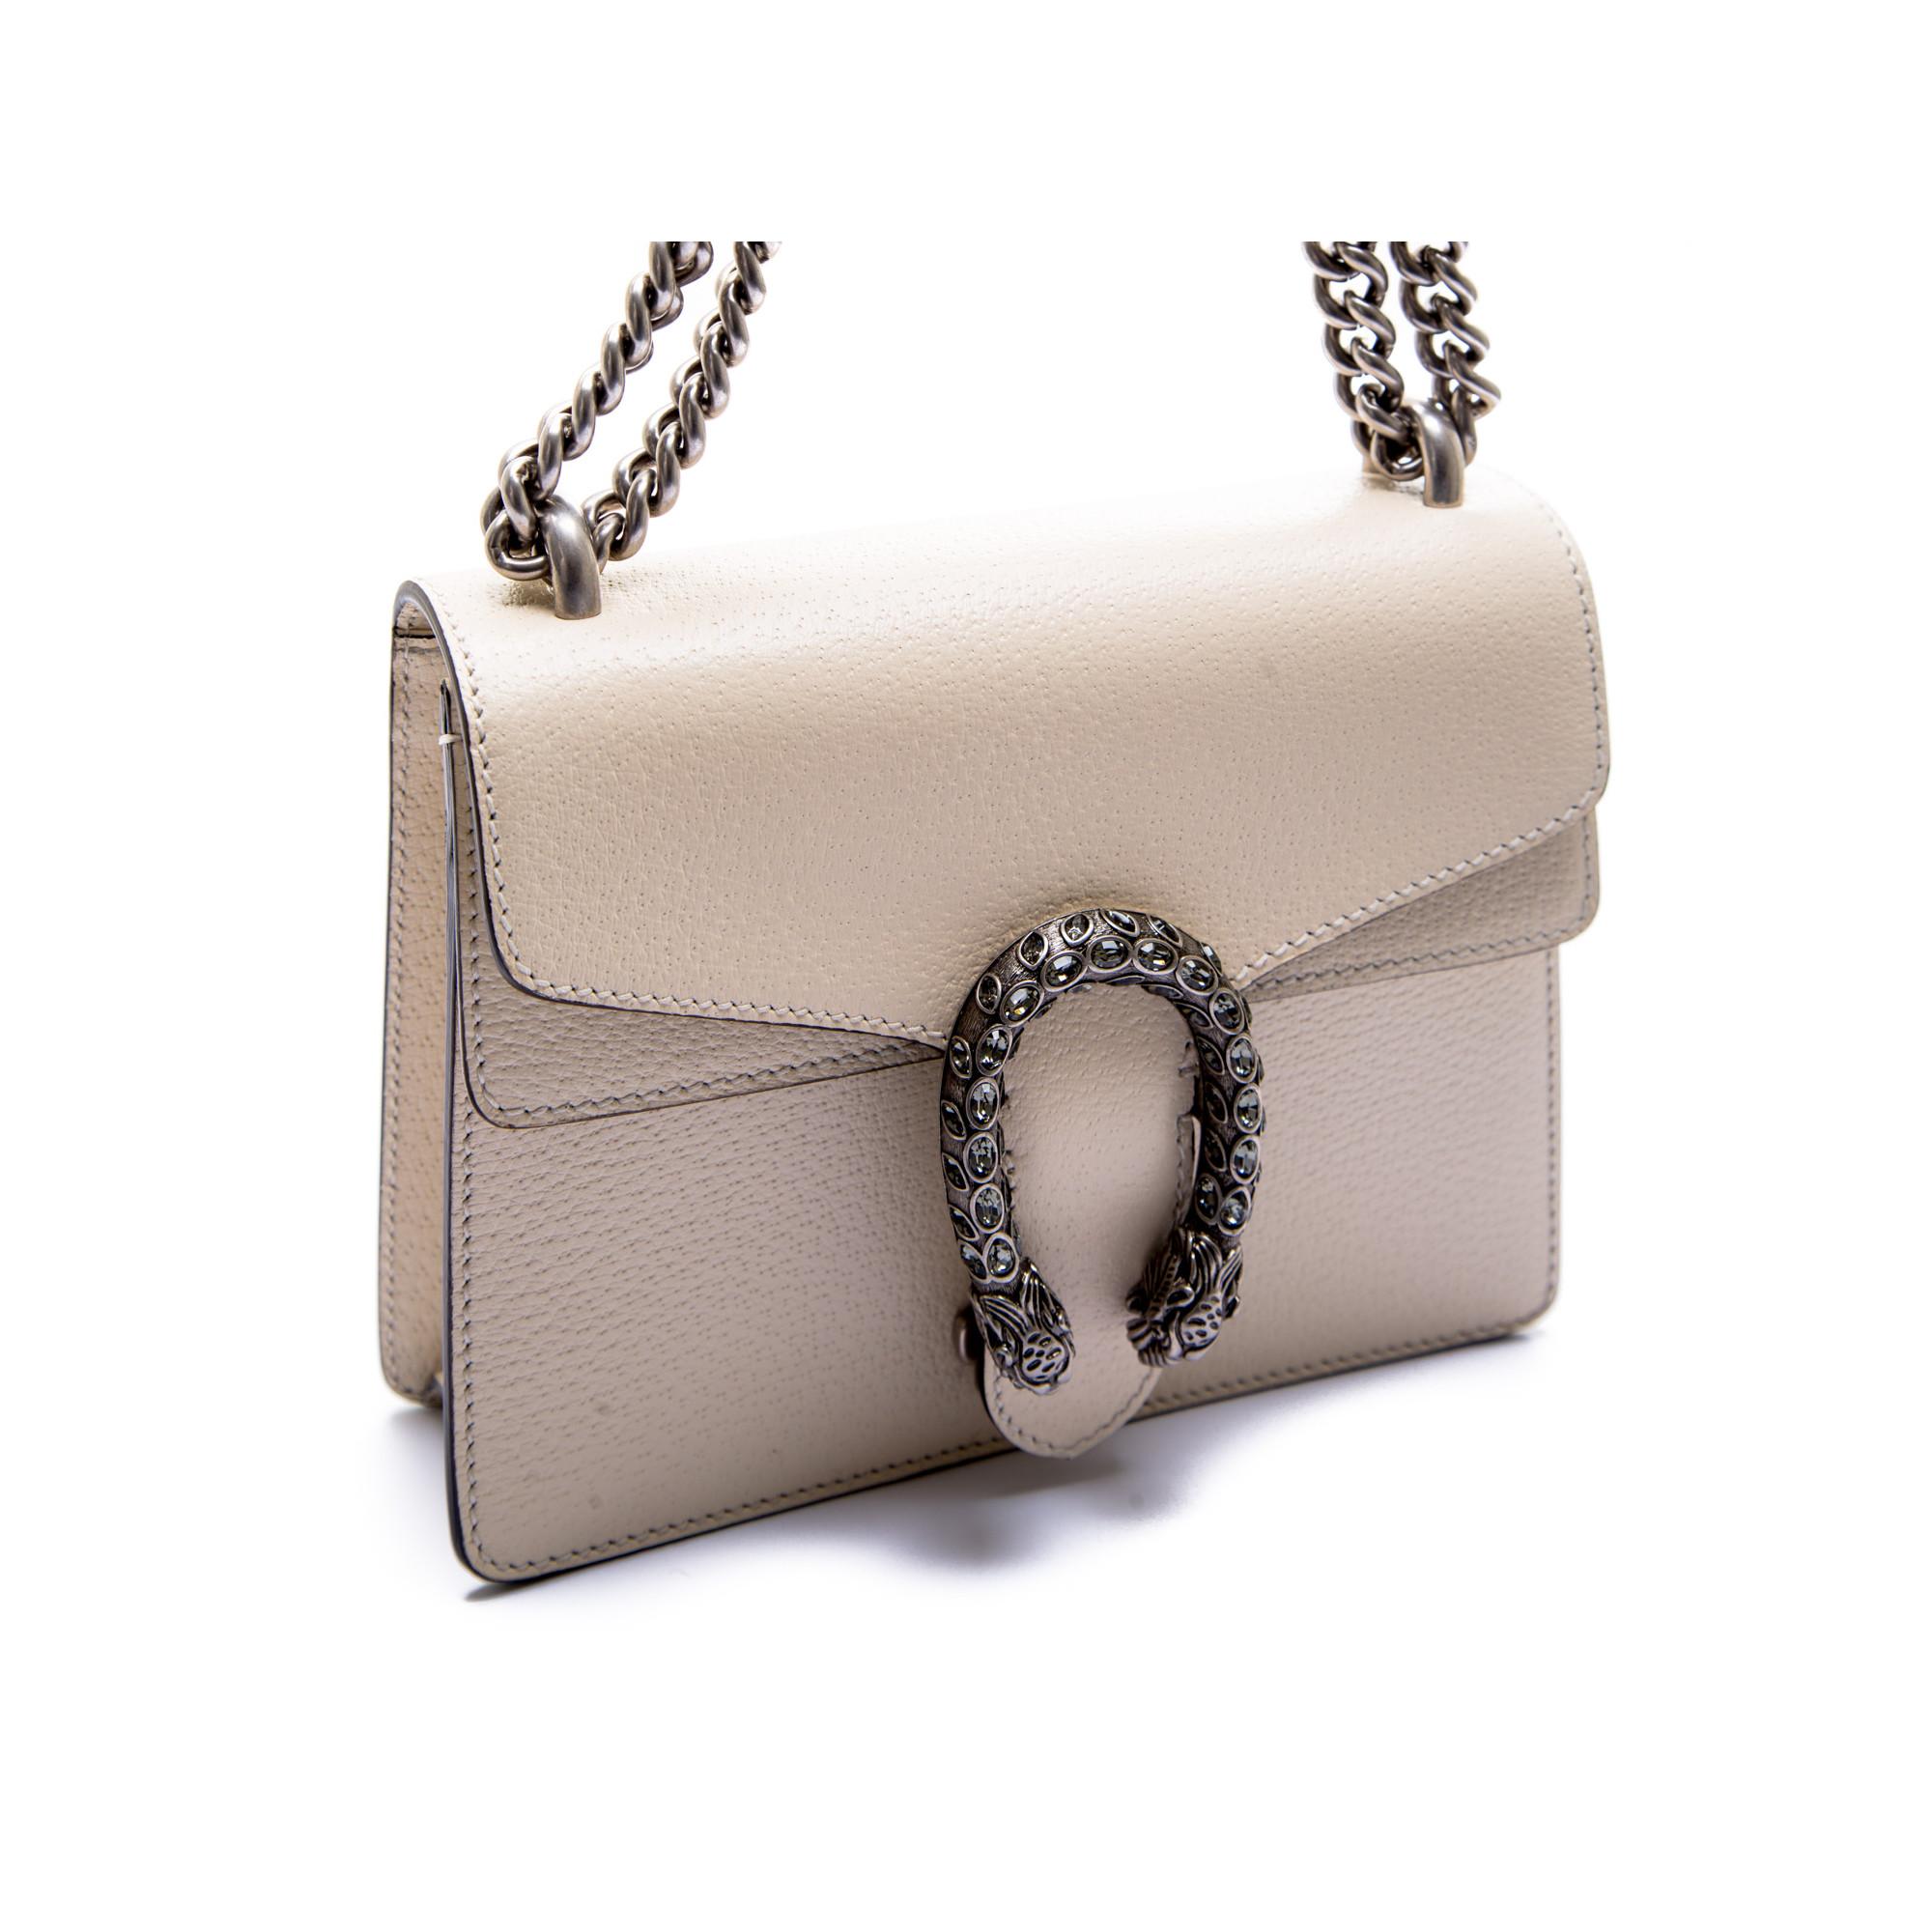 74b883ffb5c042 ... Gucci handbag dionysus Gucci handbag dionysus - www.derodeloper.com -  Derodeloper.com